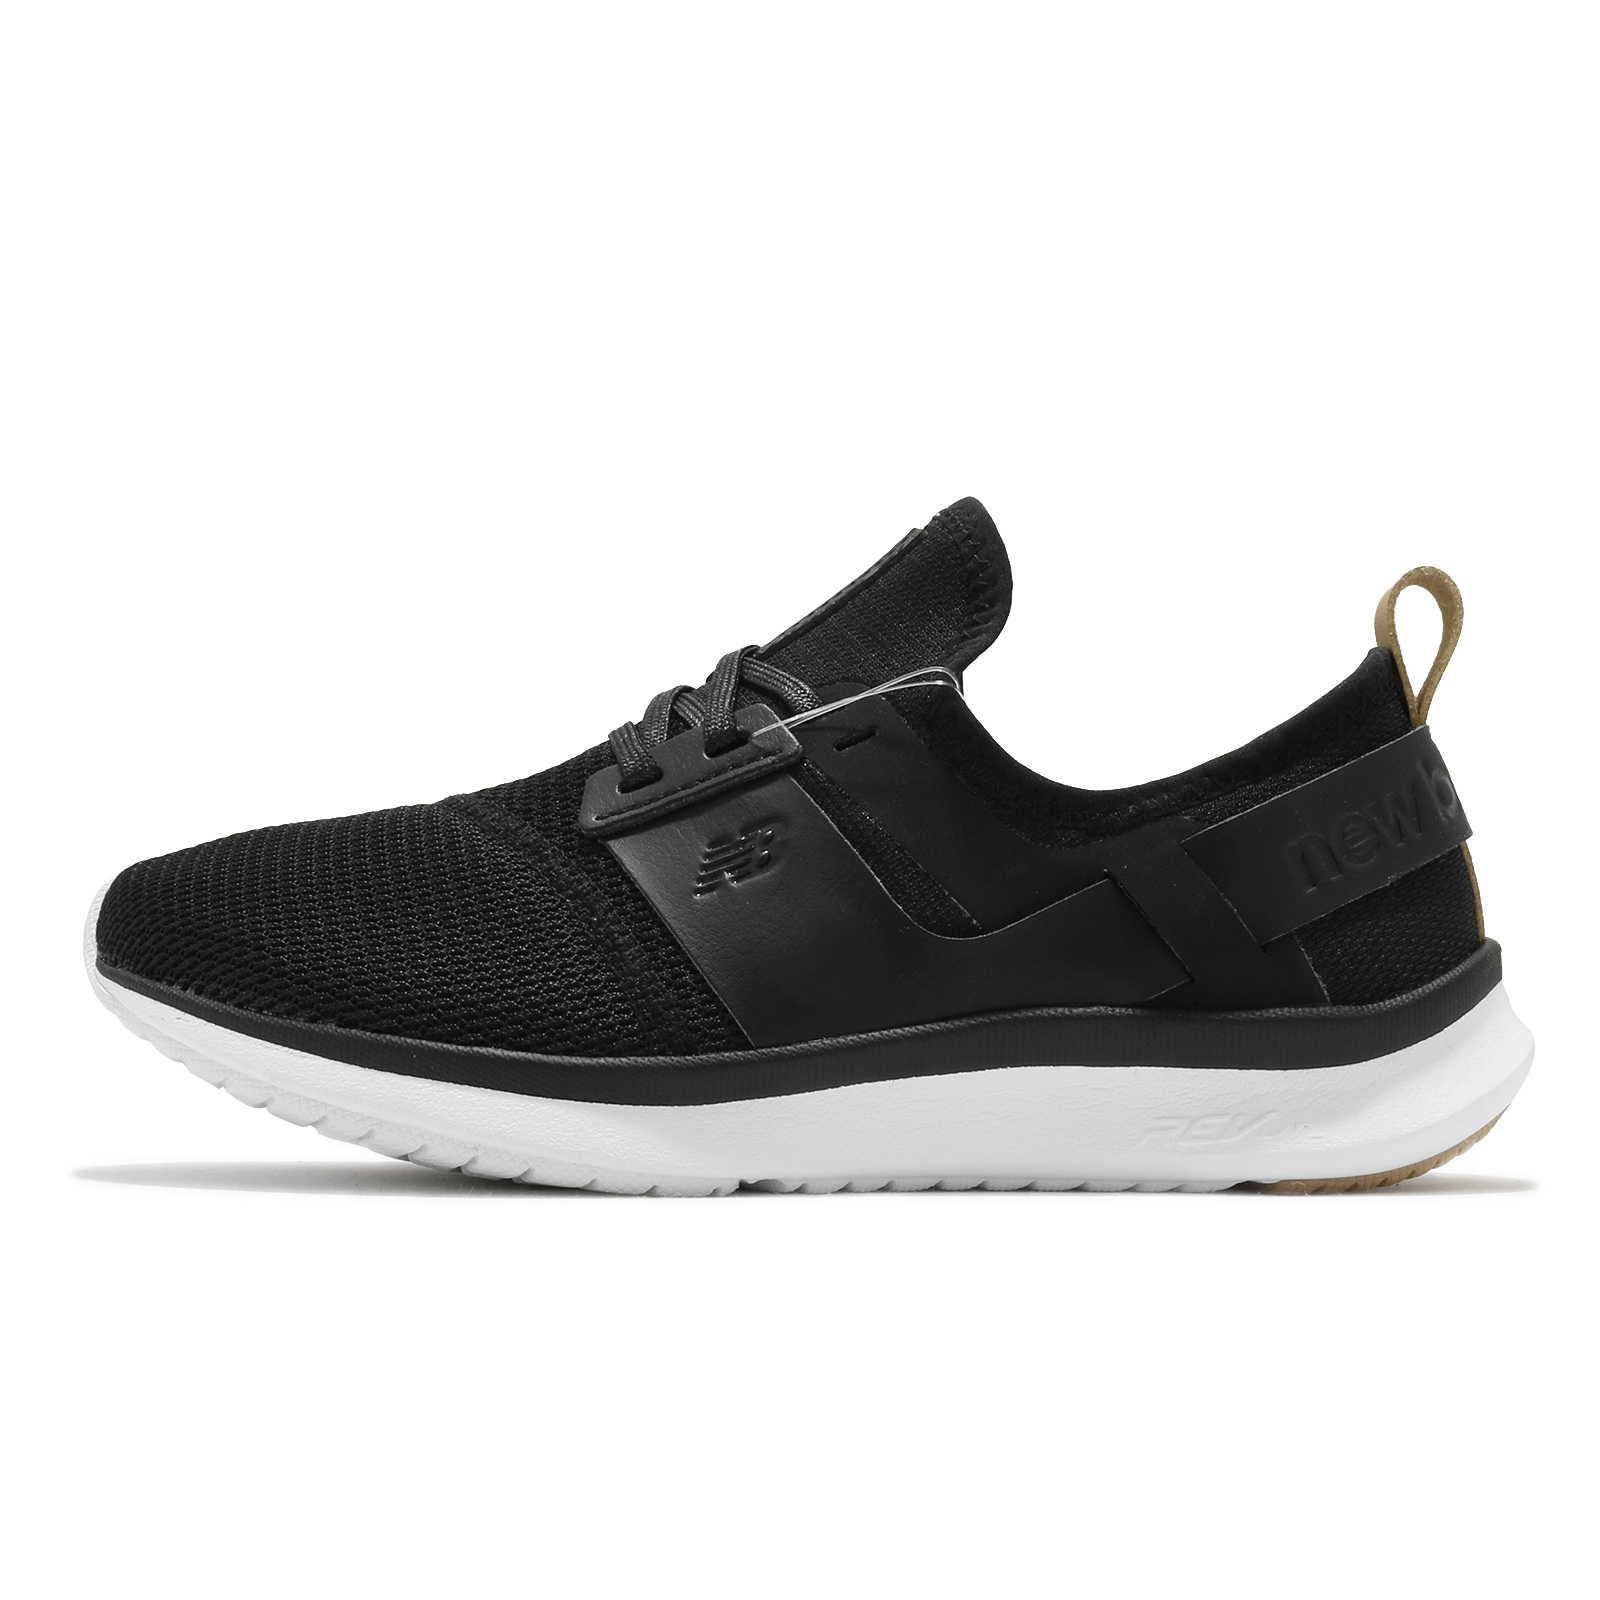 New Balance 訓練鞋 Nergize Sport 黑白 記憶鞋墊 女鞋 健身【ACS】 WNRGSXK1 B